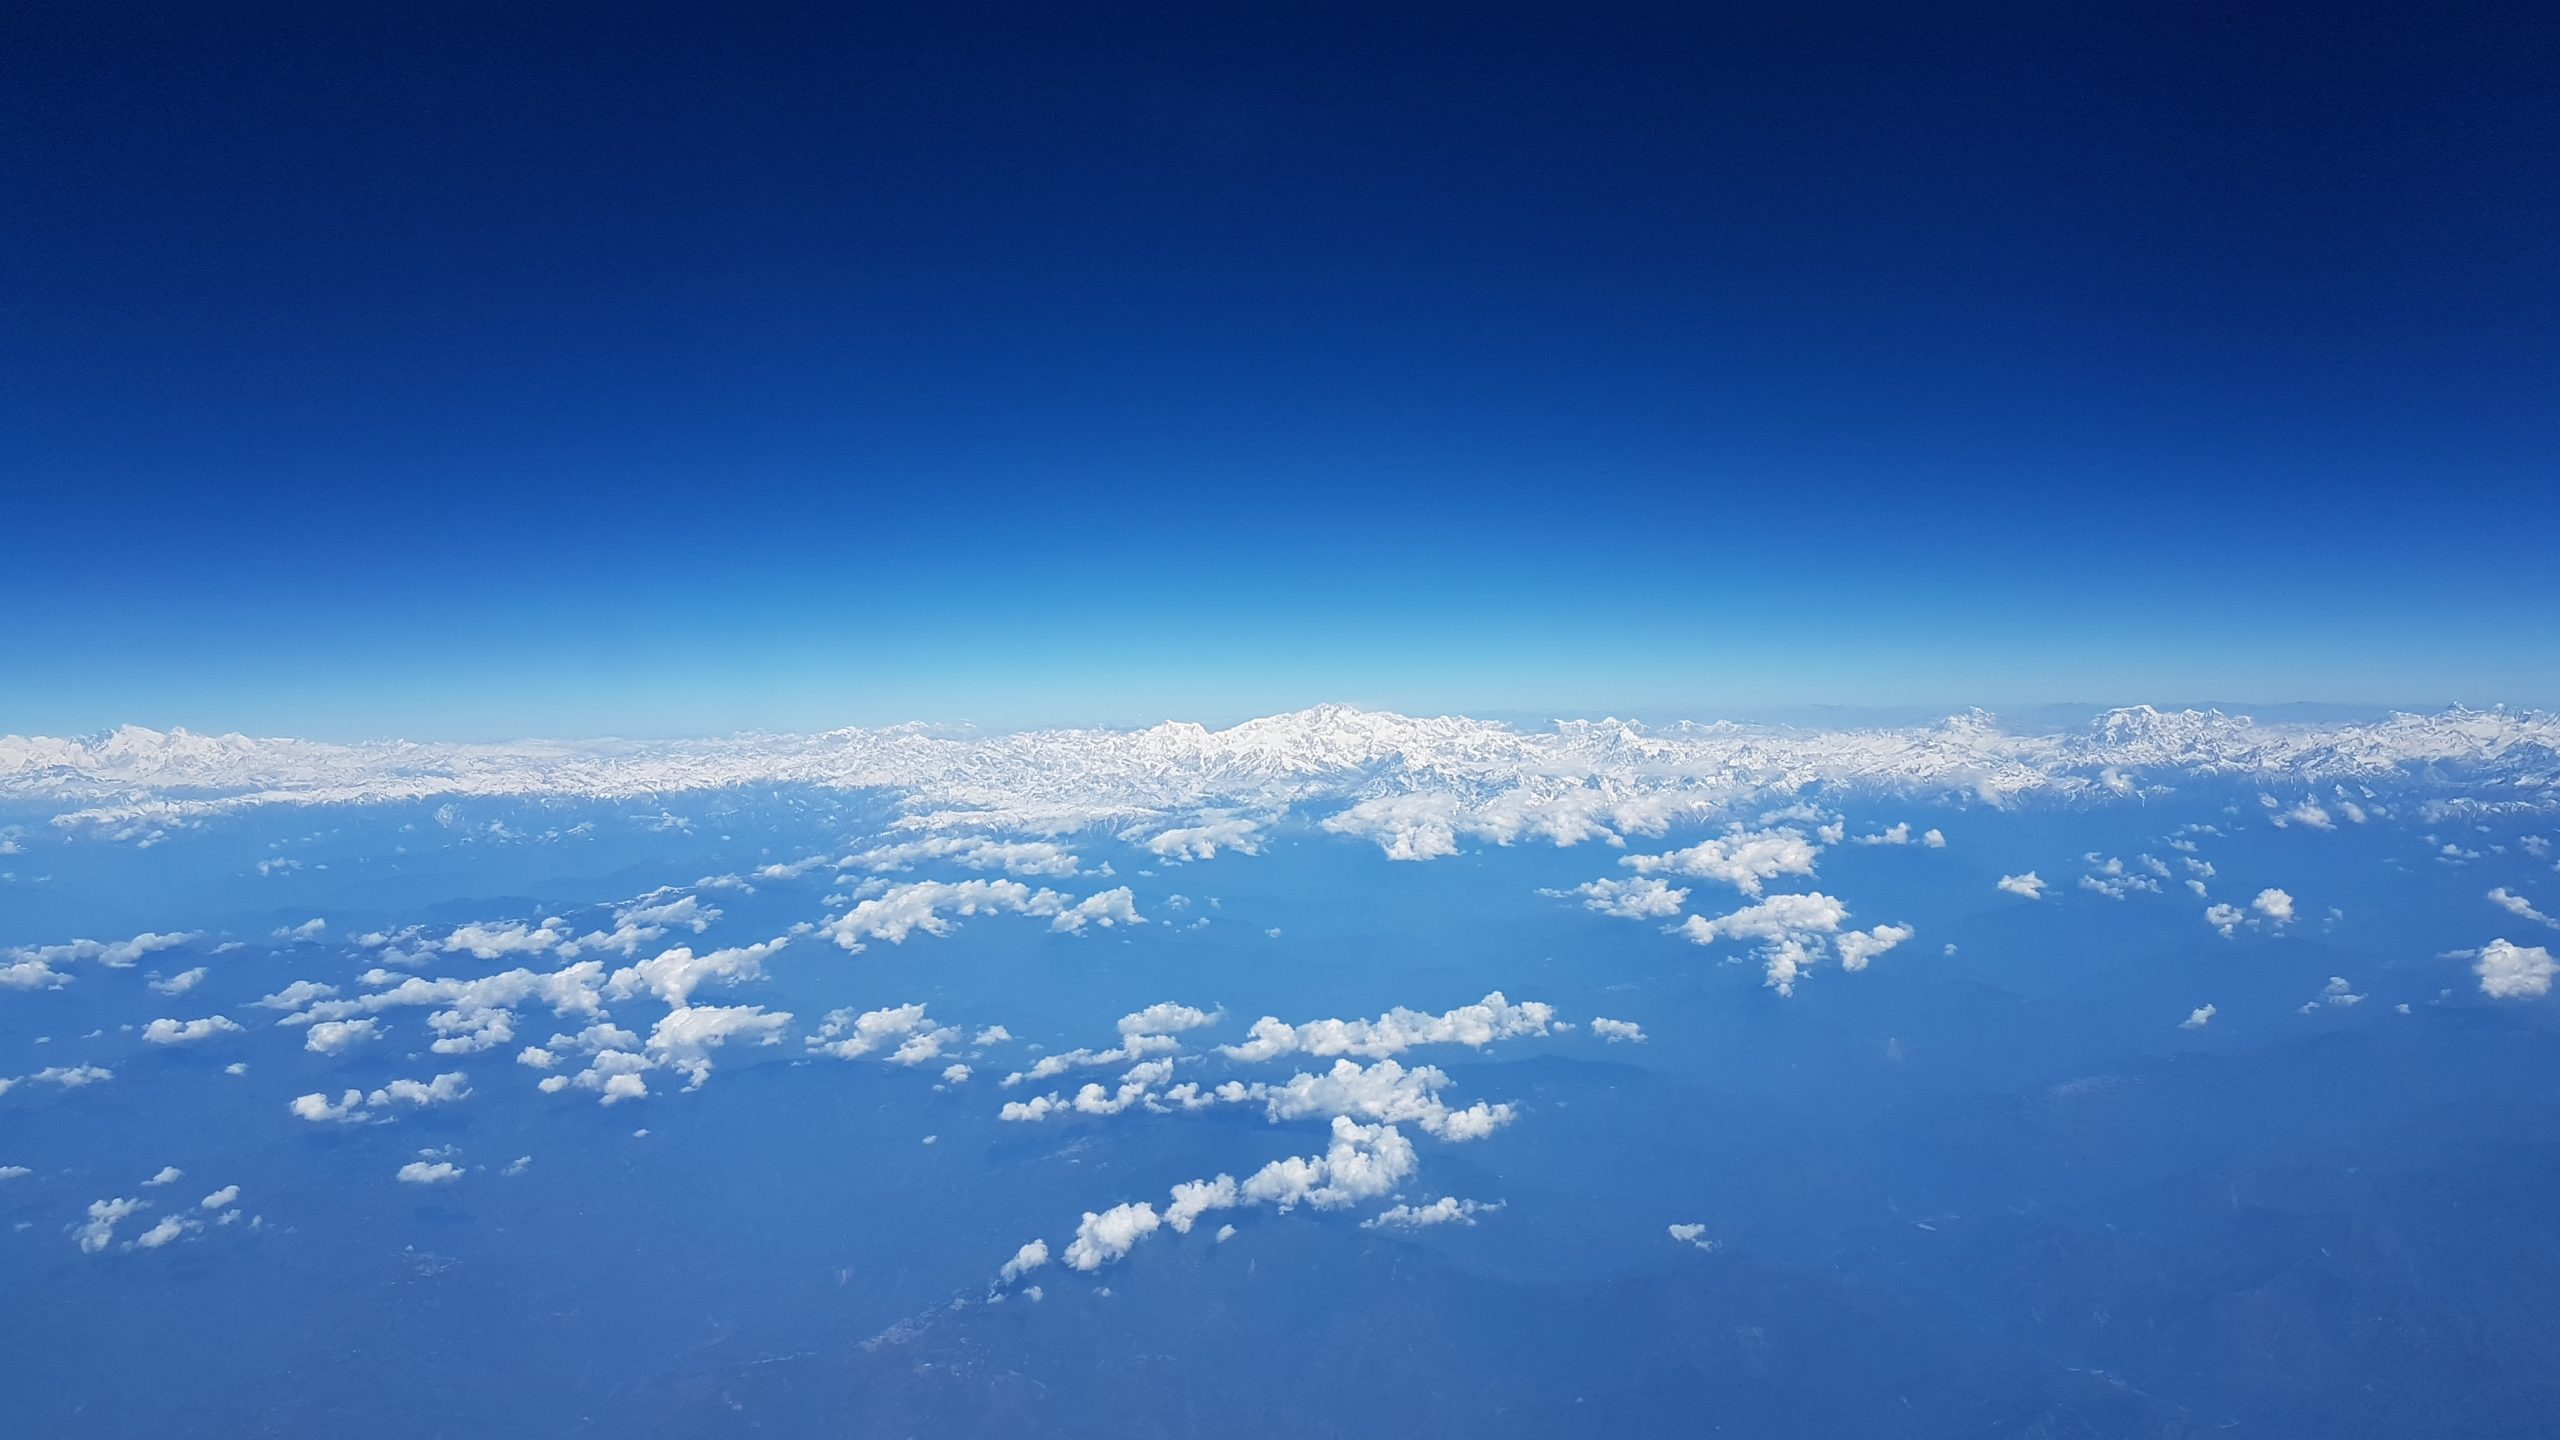 Aerial view of Himalaya